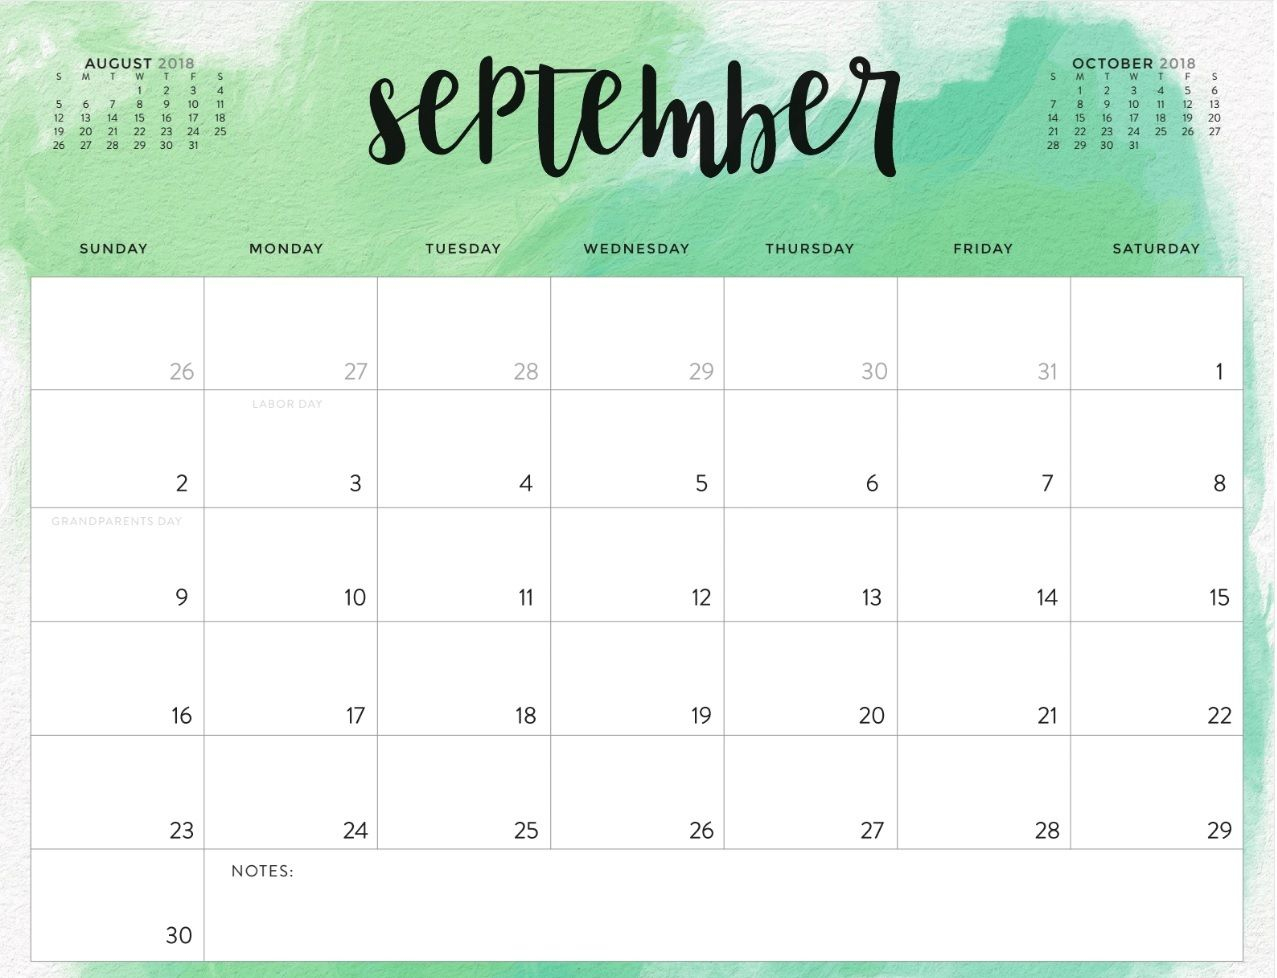 September 2018 Calendar Printable Waterproof | Printable Calendar with regard to Blank Printable September Calendar